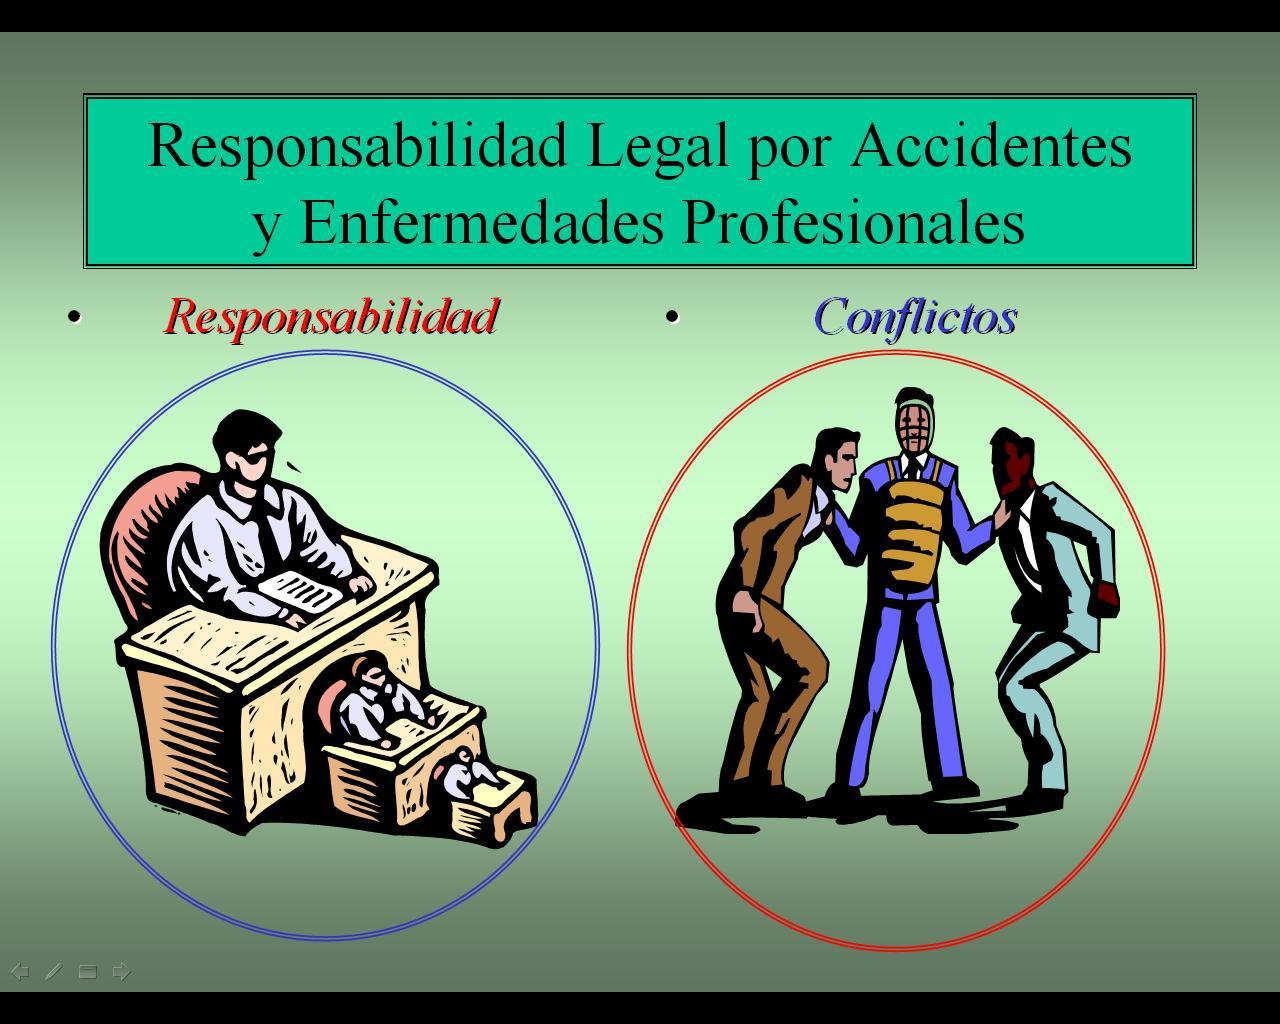 Responsabilidad legal responsabilidad institucional for Responsabilidad legal